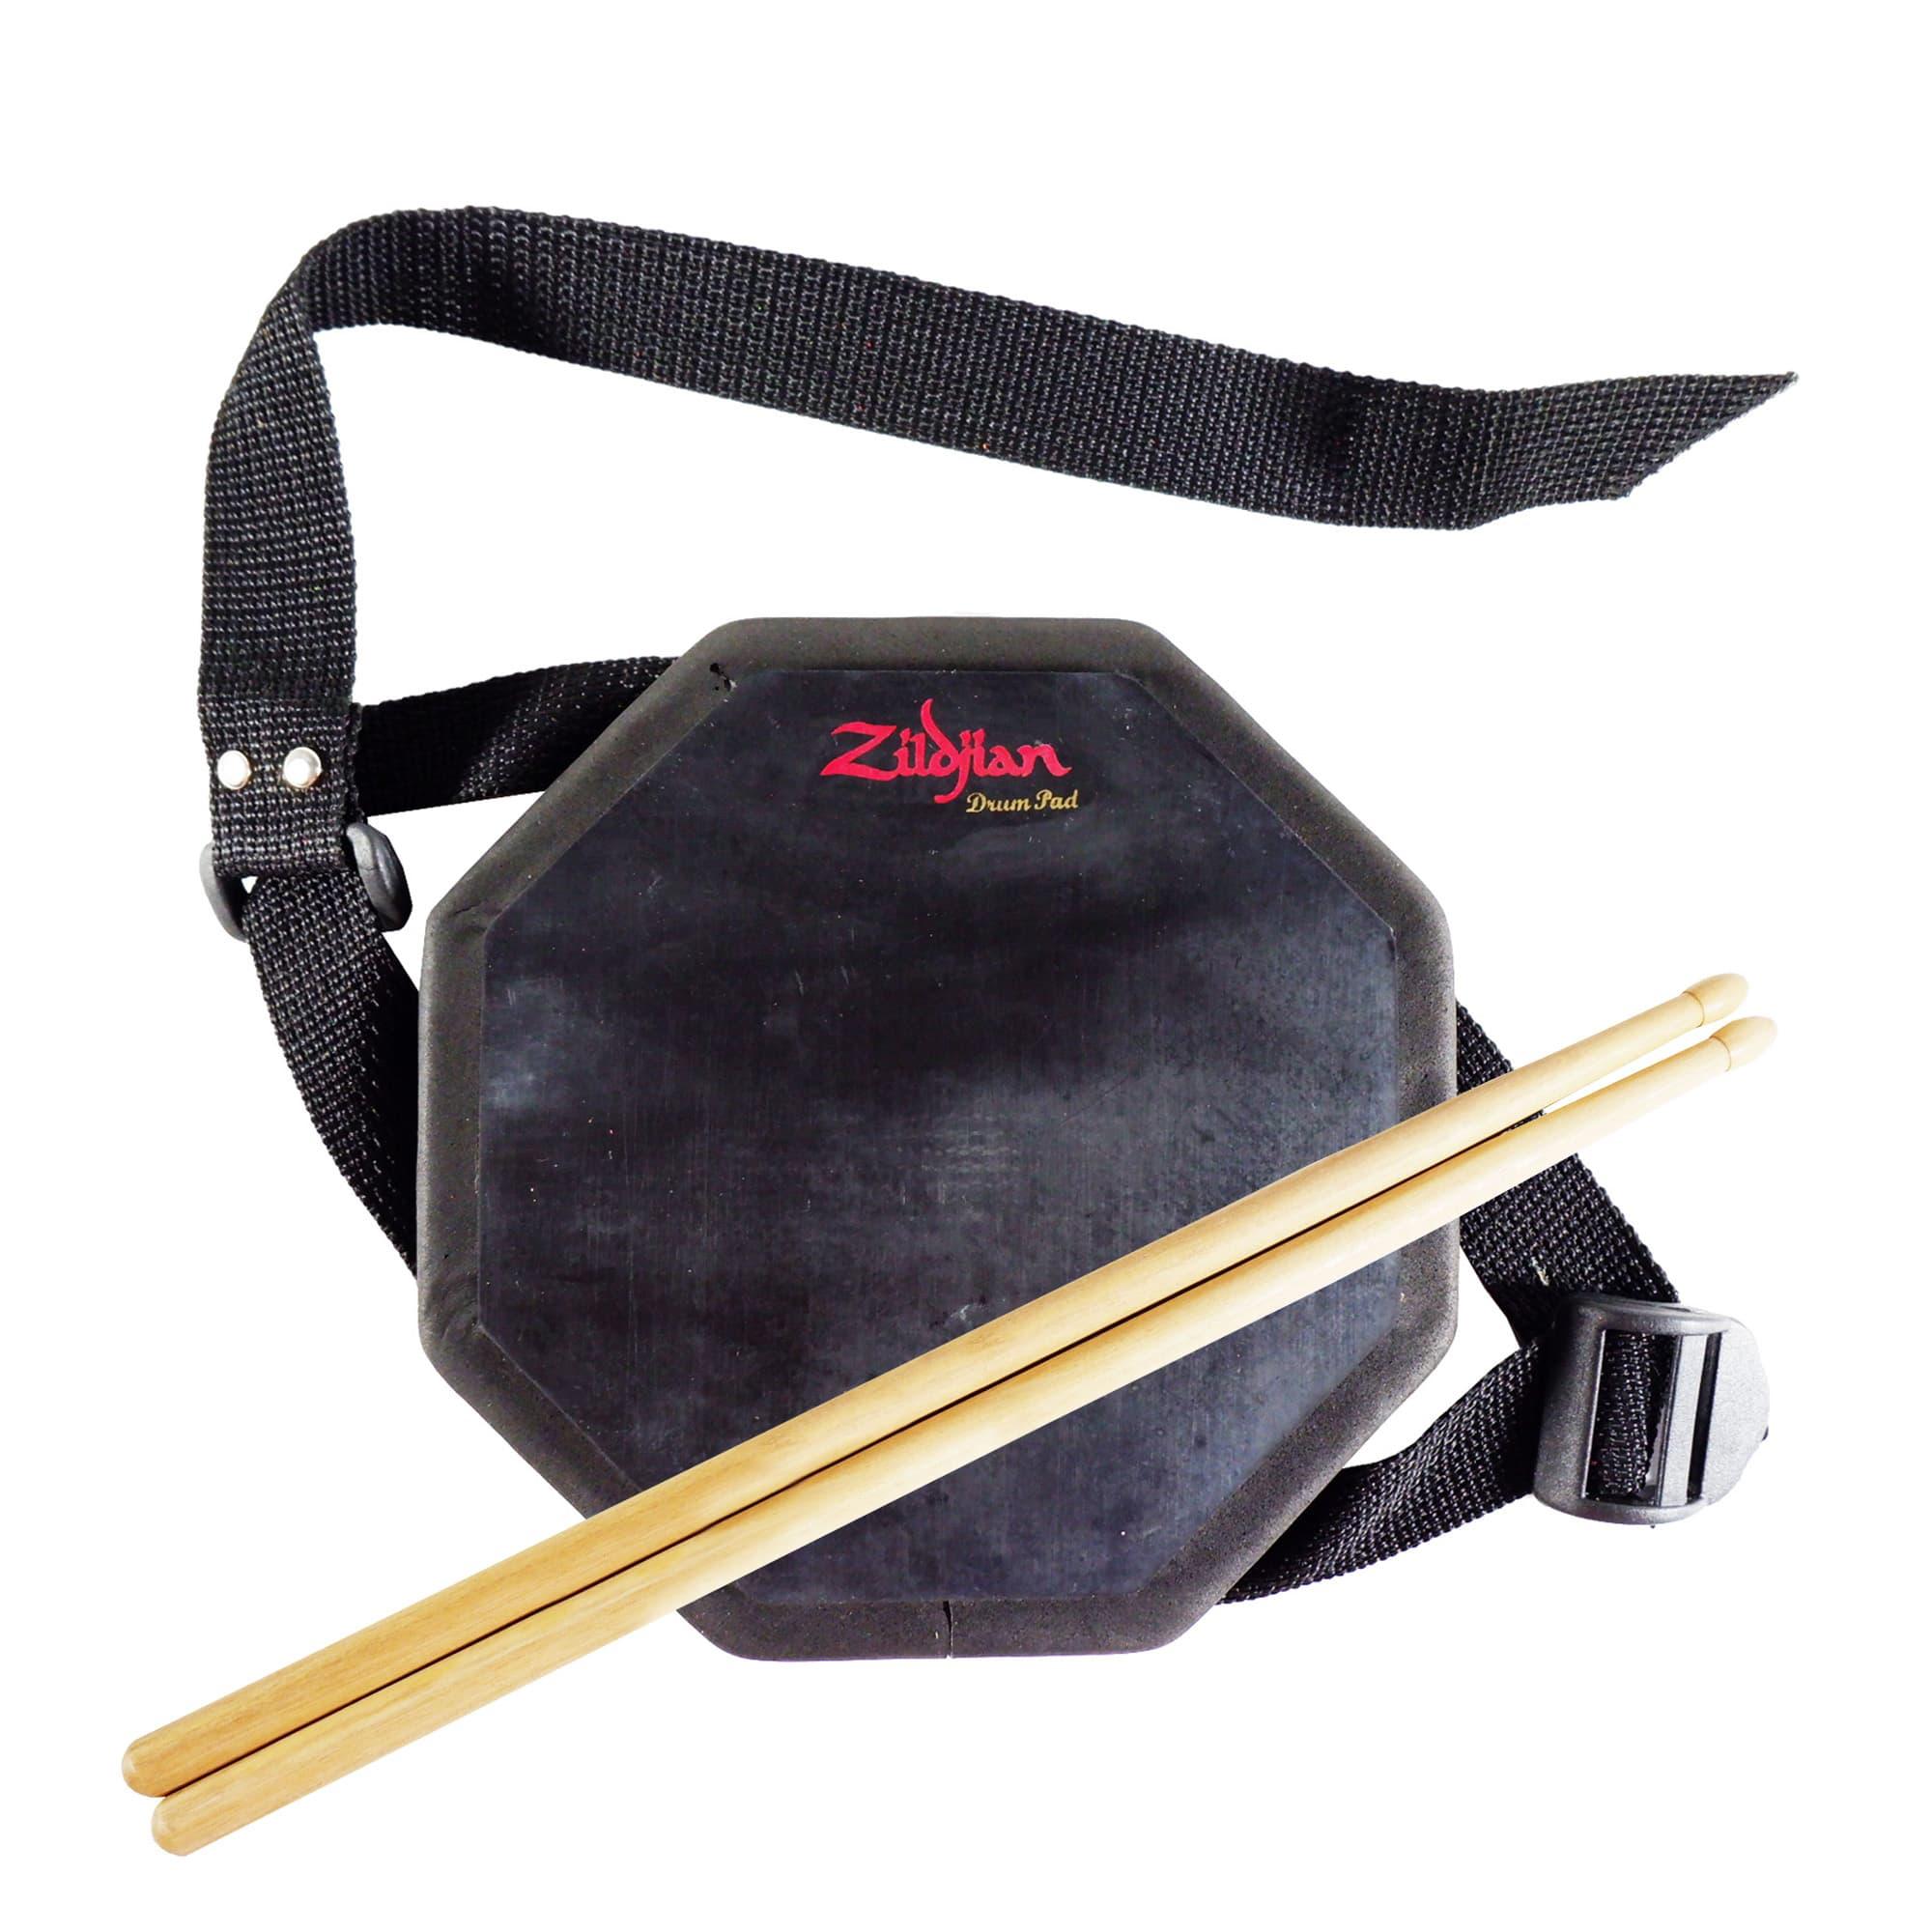 harga Drum Pad 6 Inch & Stick Drum (zildjian / Tama / Sonor) Blanja.com